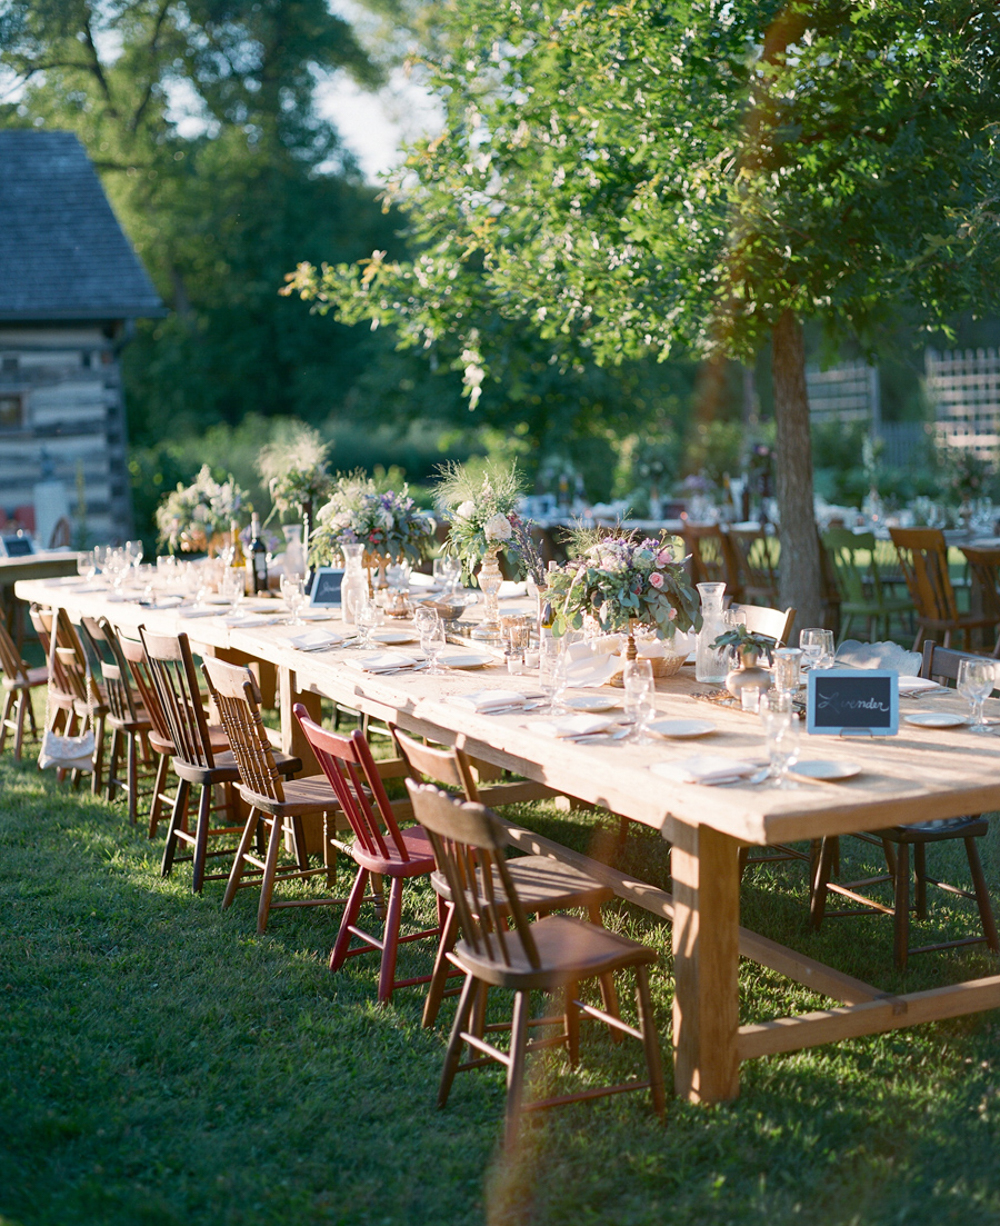 Ramhorn_Farm_Wedding_Photos_037.jpg